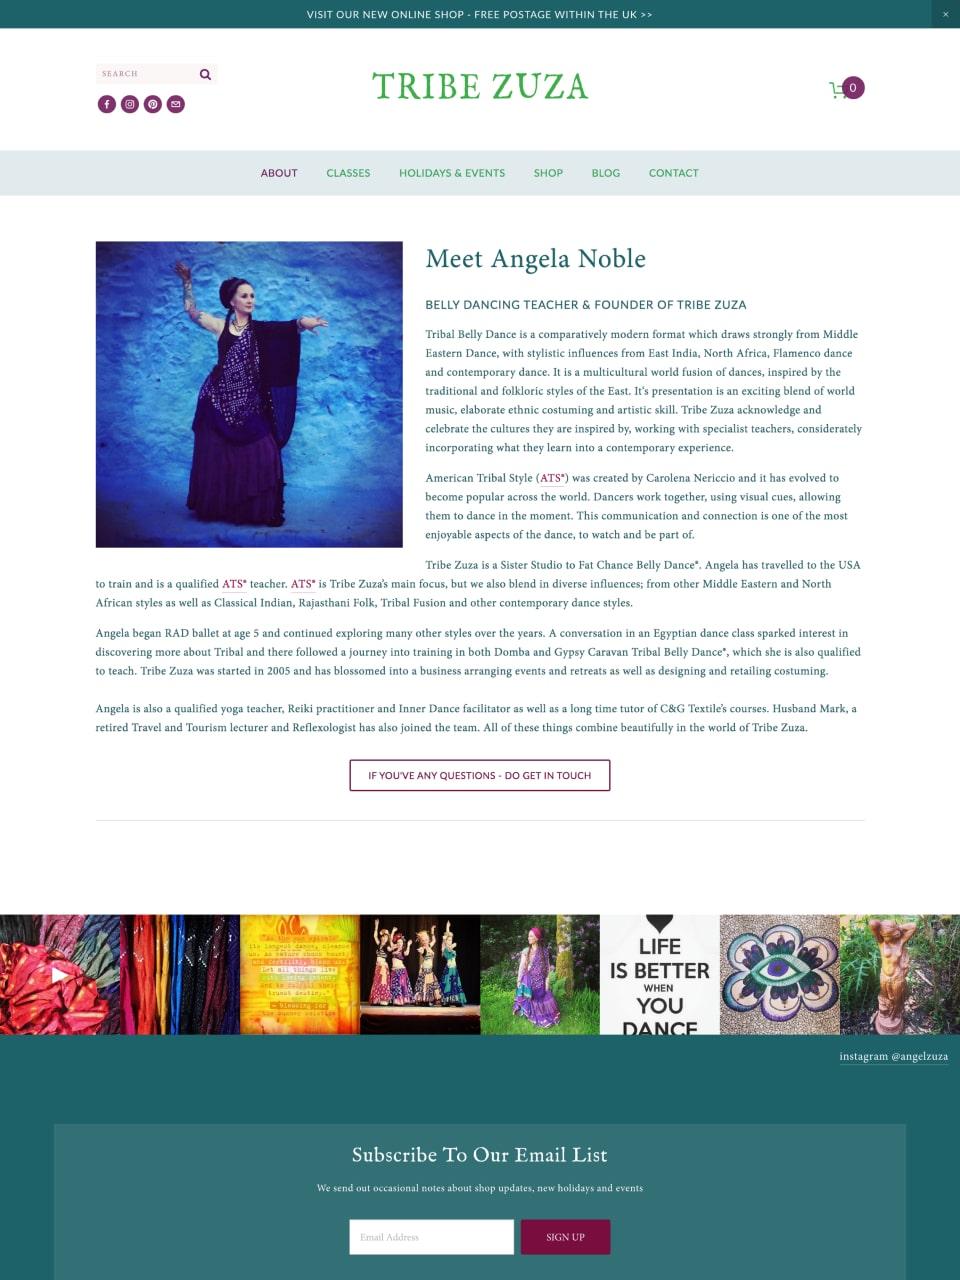 Tribe Zuza Website  About Angela Noble